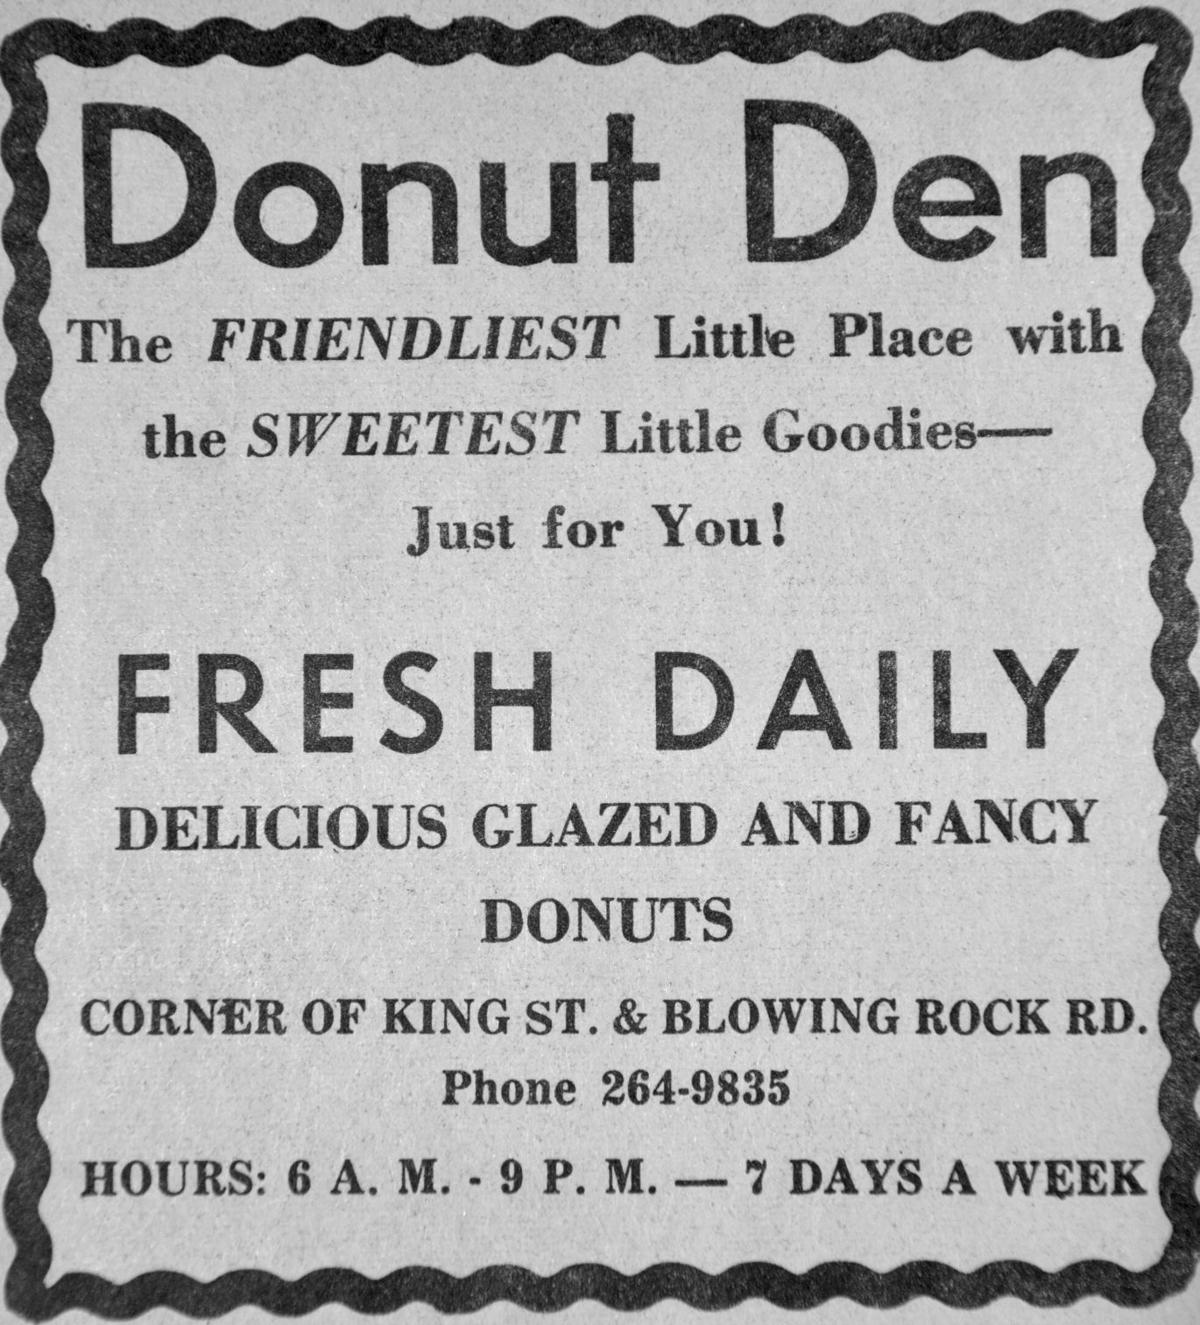 1967 advertisement